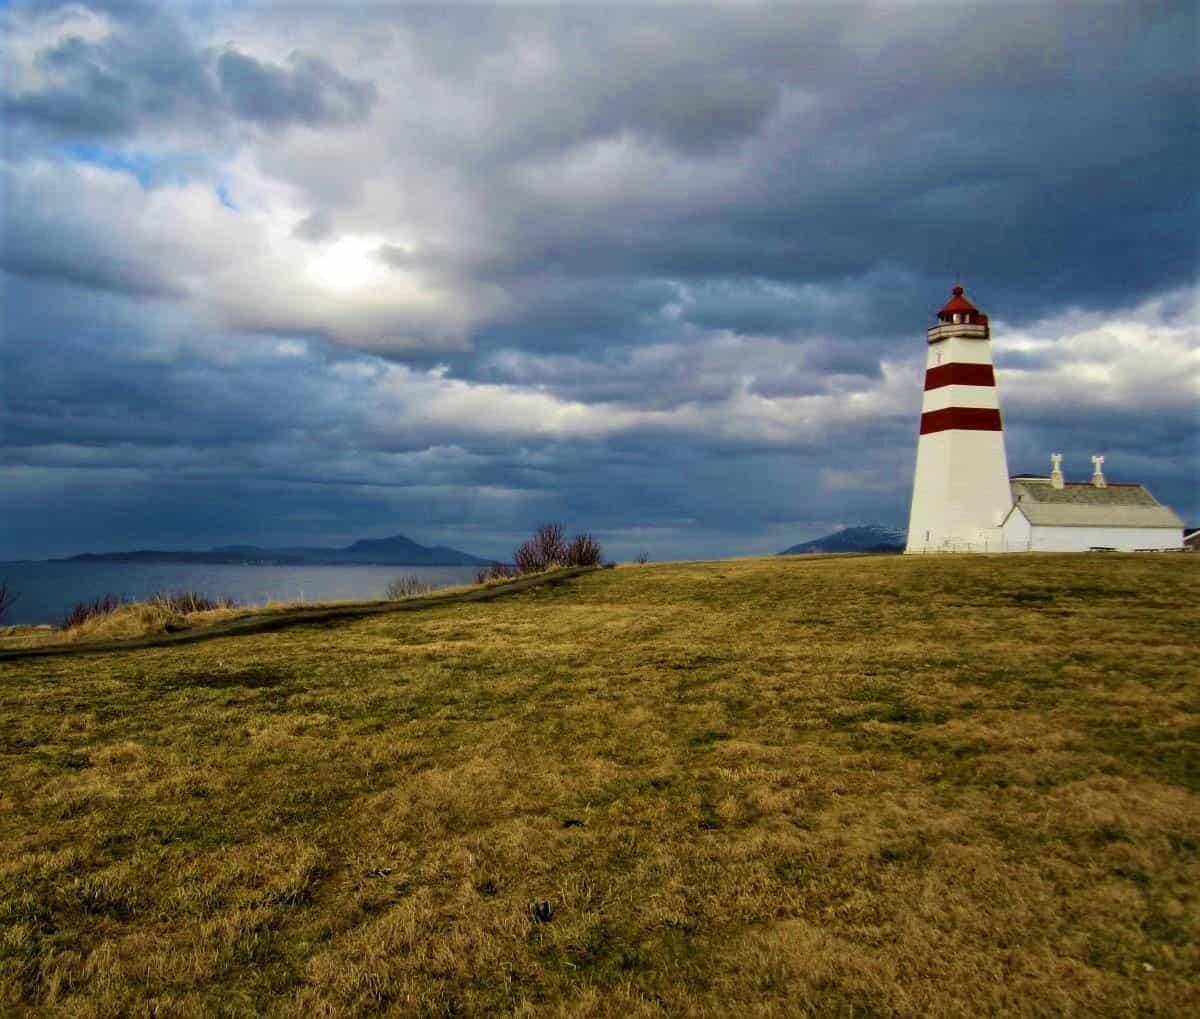 Ålesund Alnes Lighthouse in Godøy